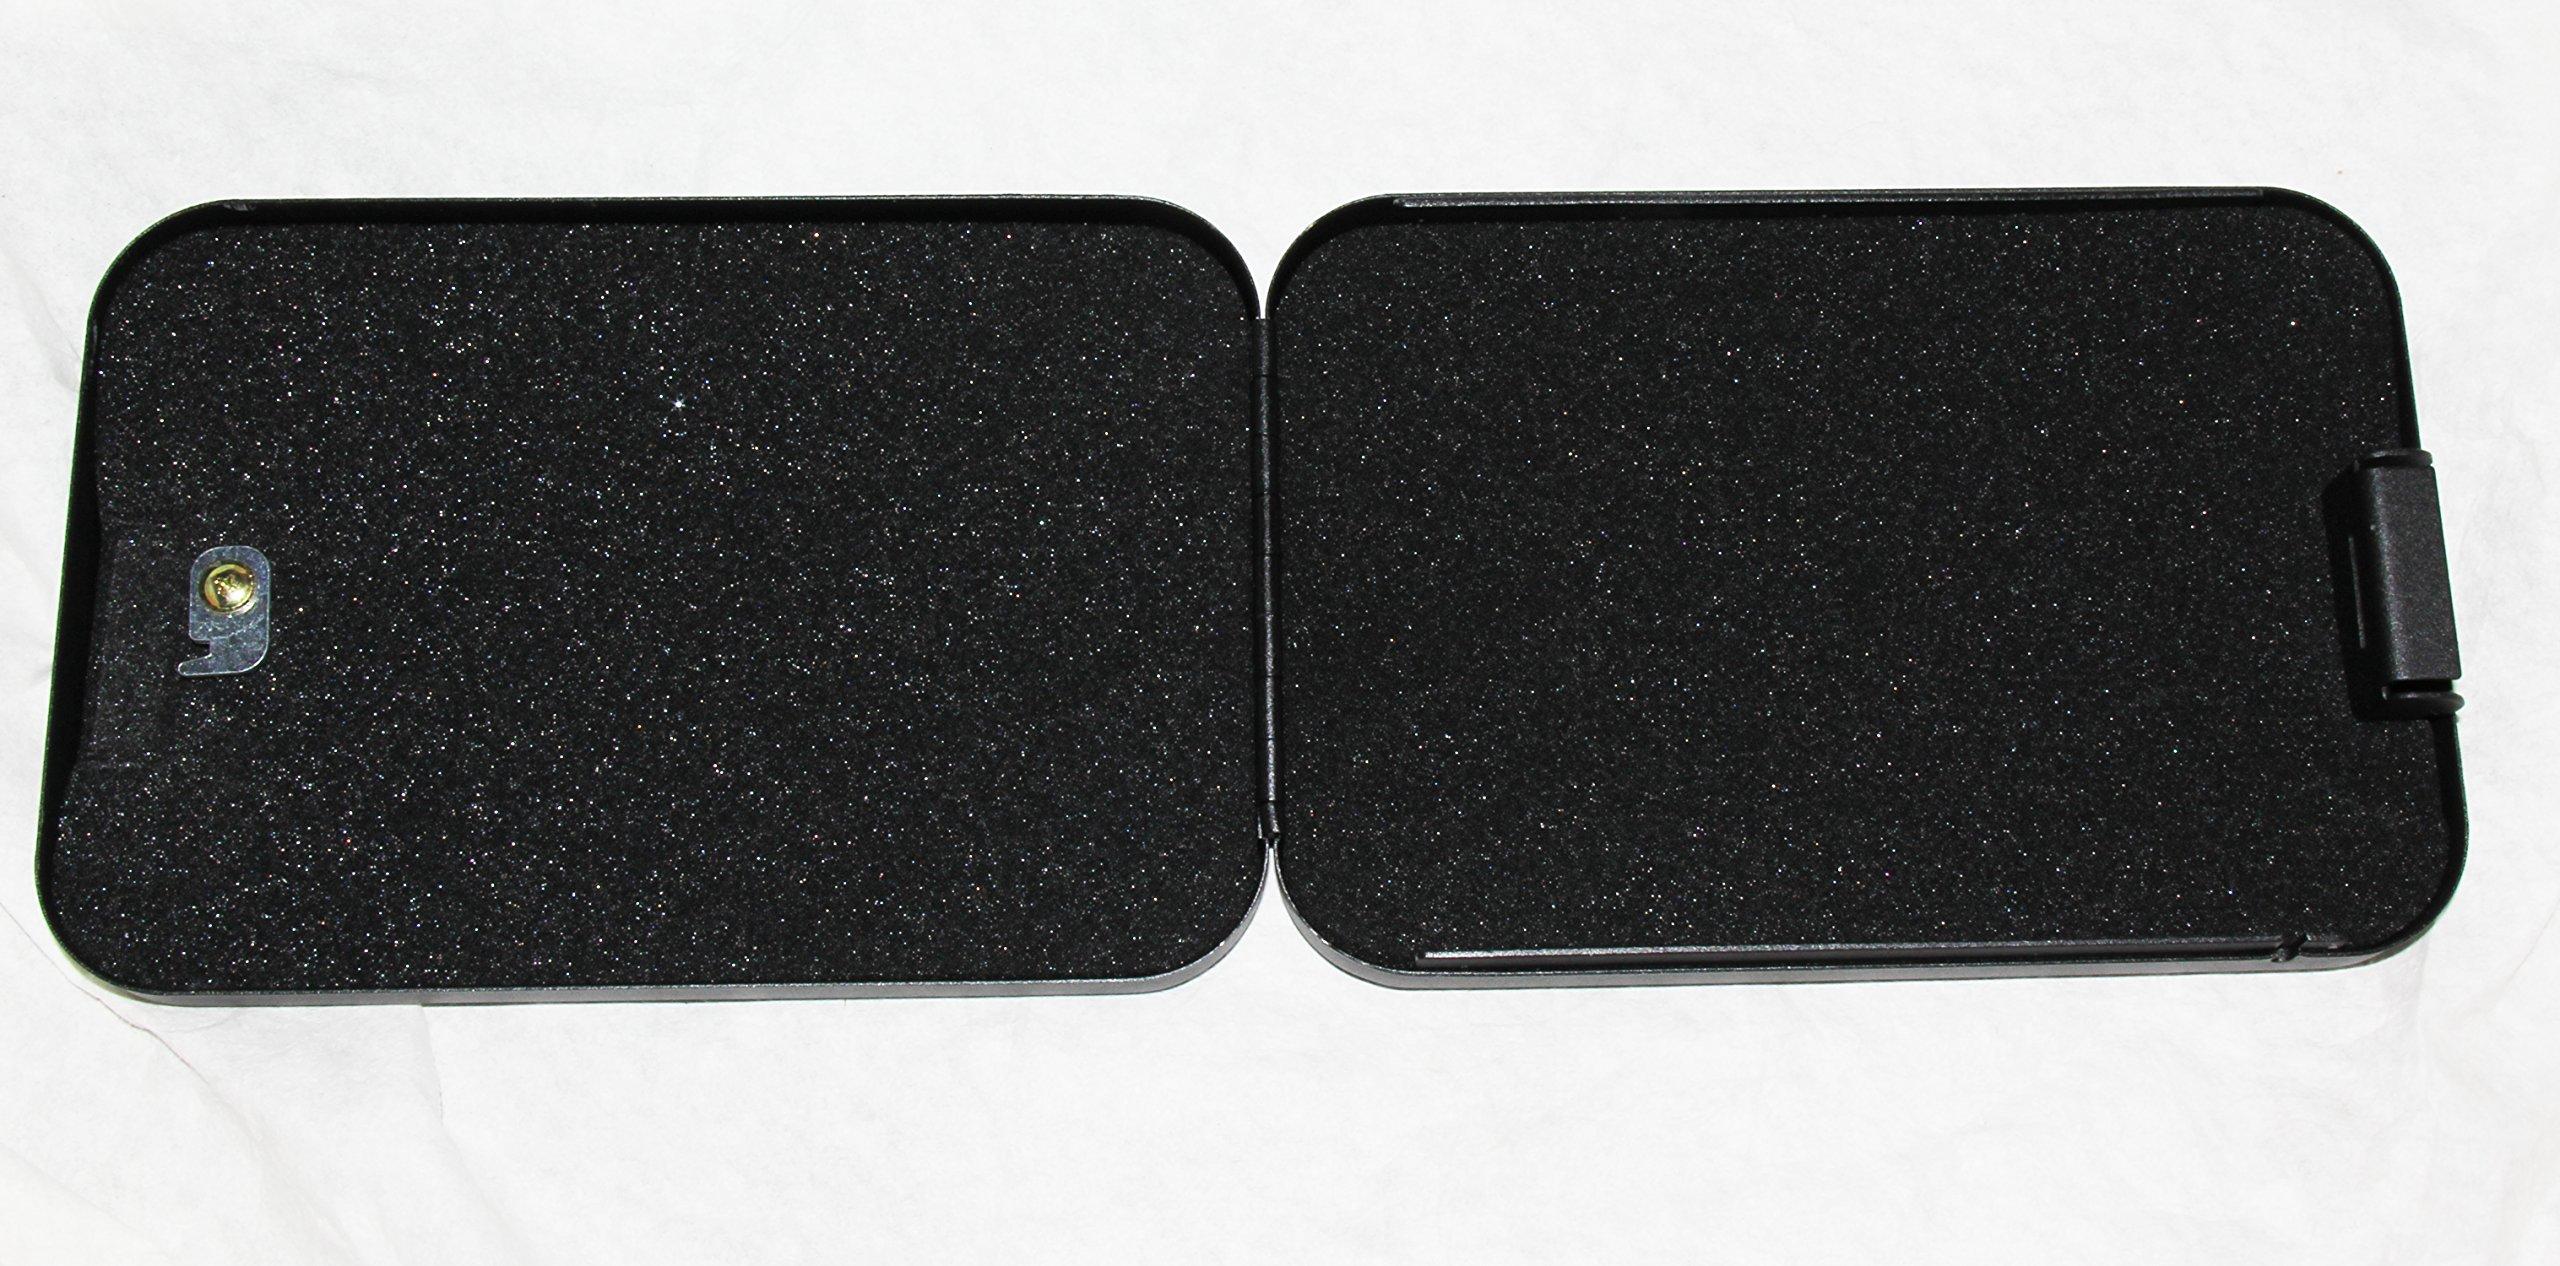 Gun Safety solutions Full Size Handgun Safe Vault Security Pistol Case Key Lock Box